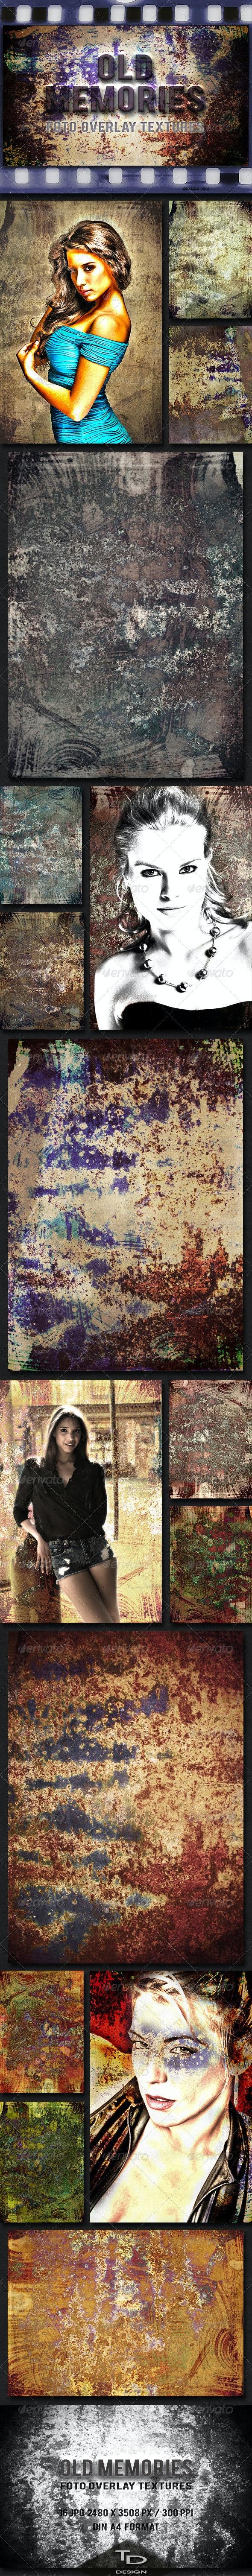 Old Memories 16 Grunge Set - Urban Backgrounds